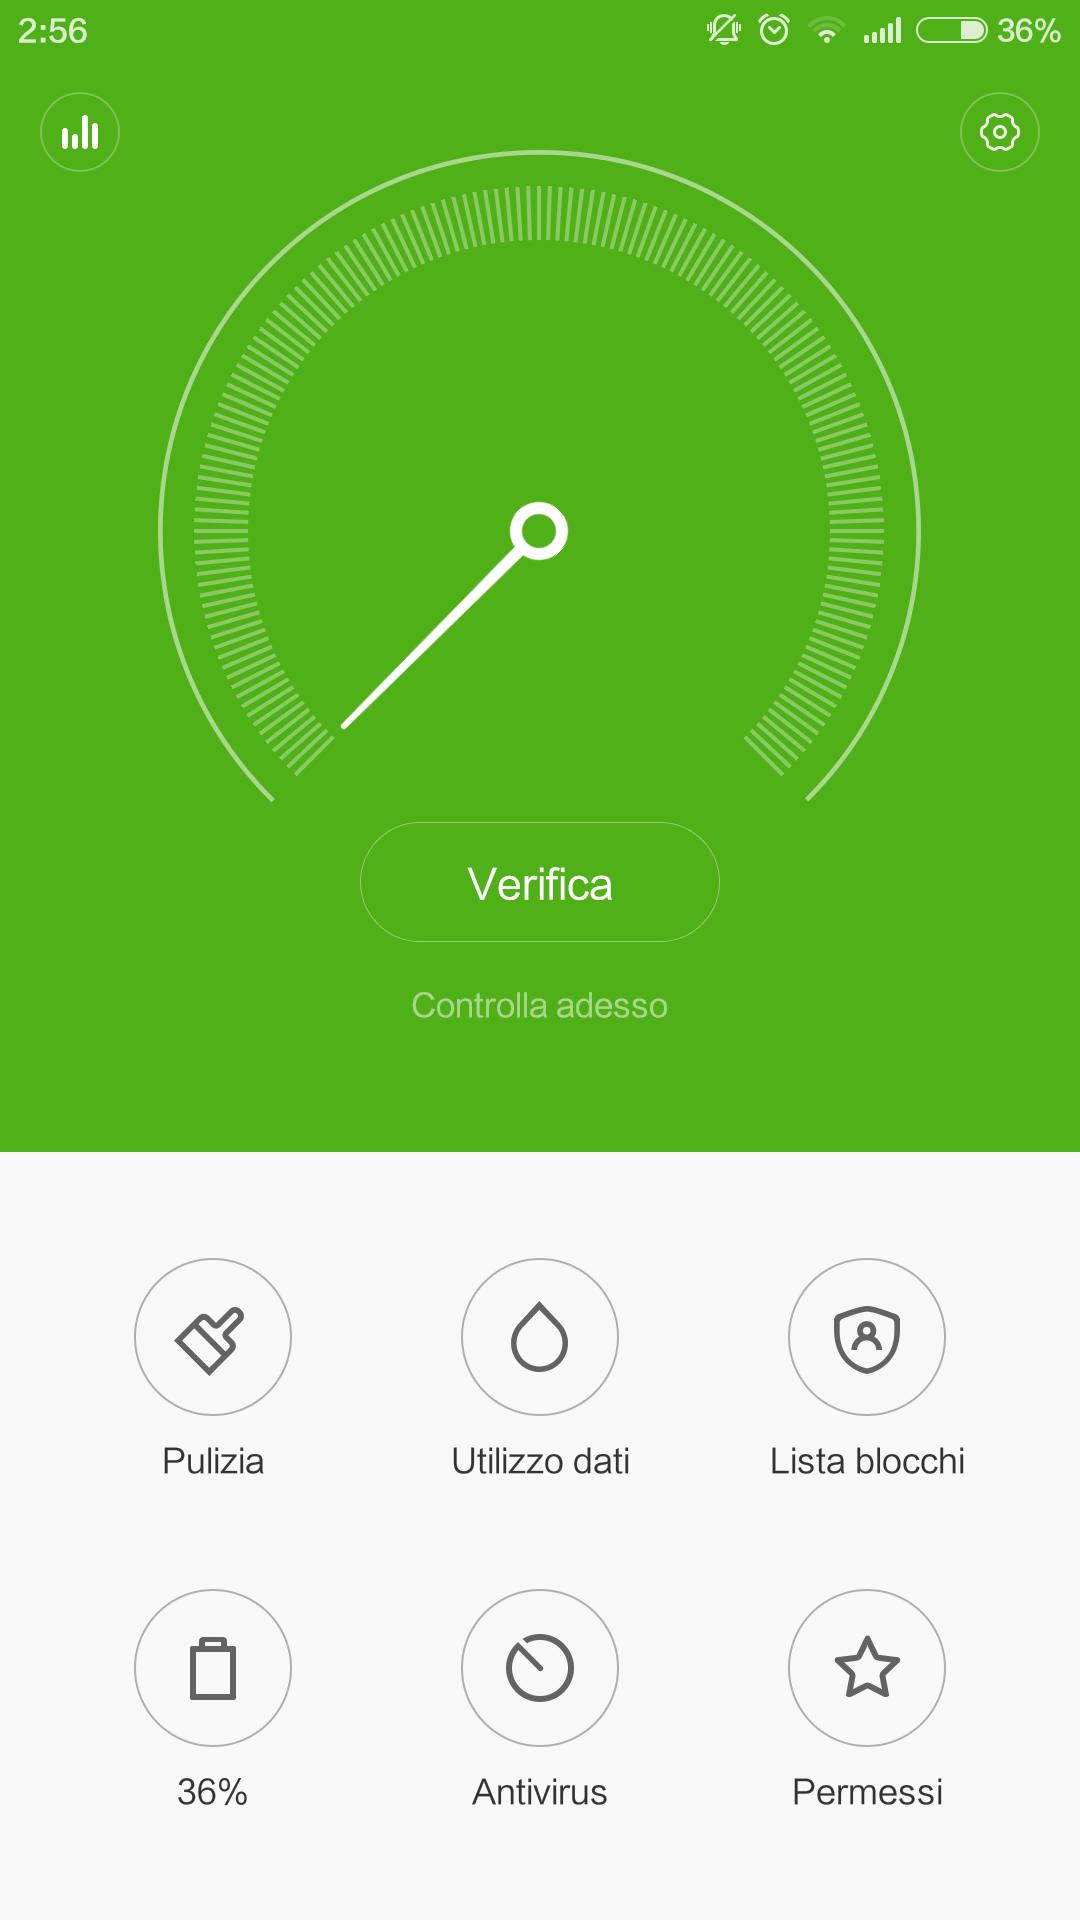 Screenshot_com.miui.securitycenter_2015-09-24-02-56-03